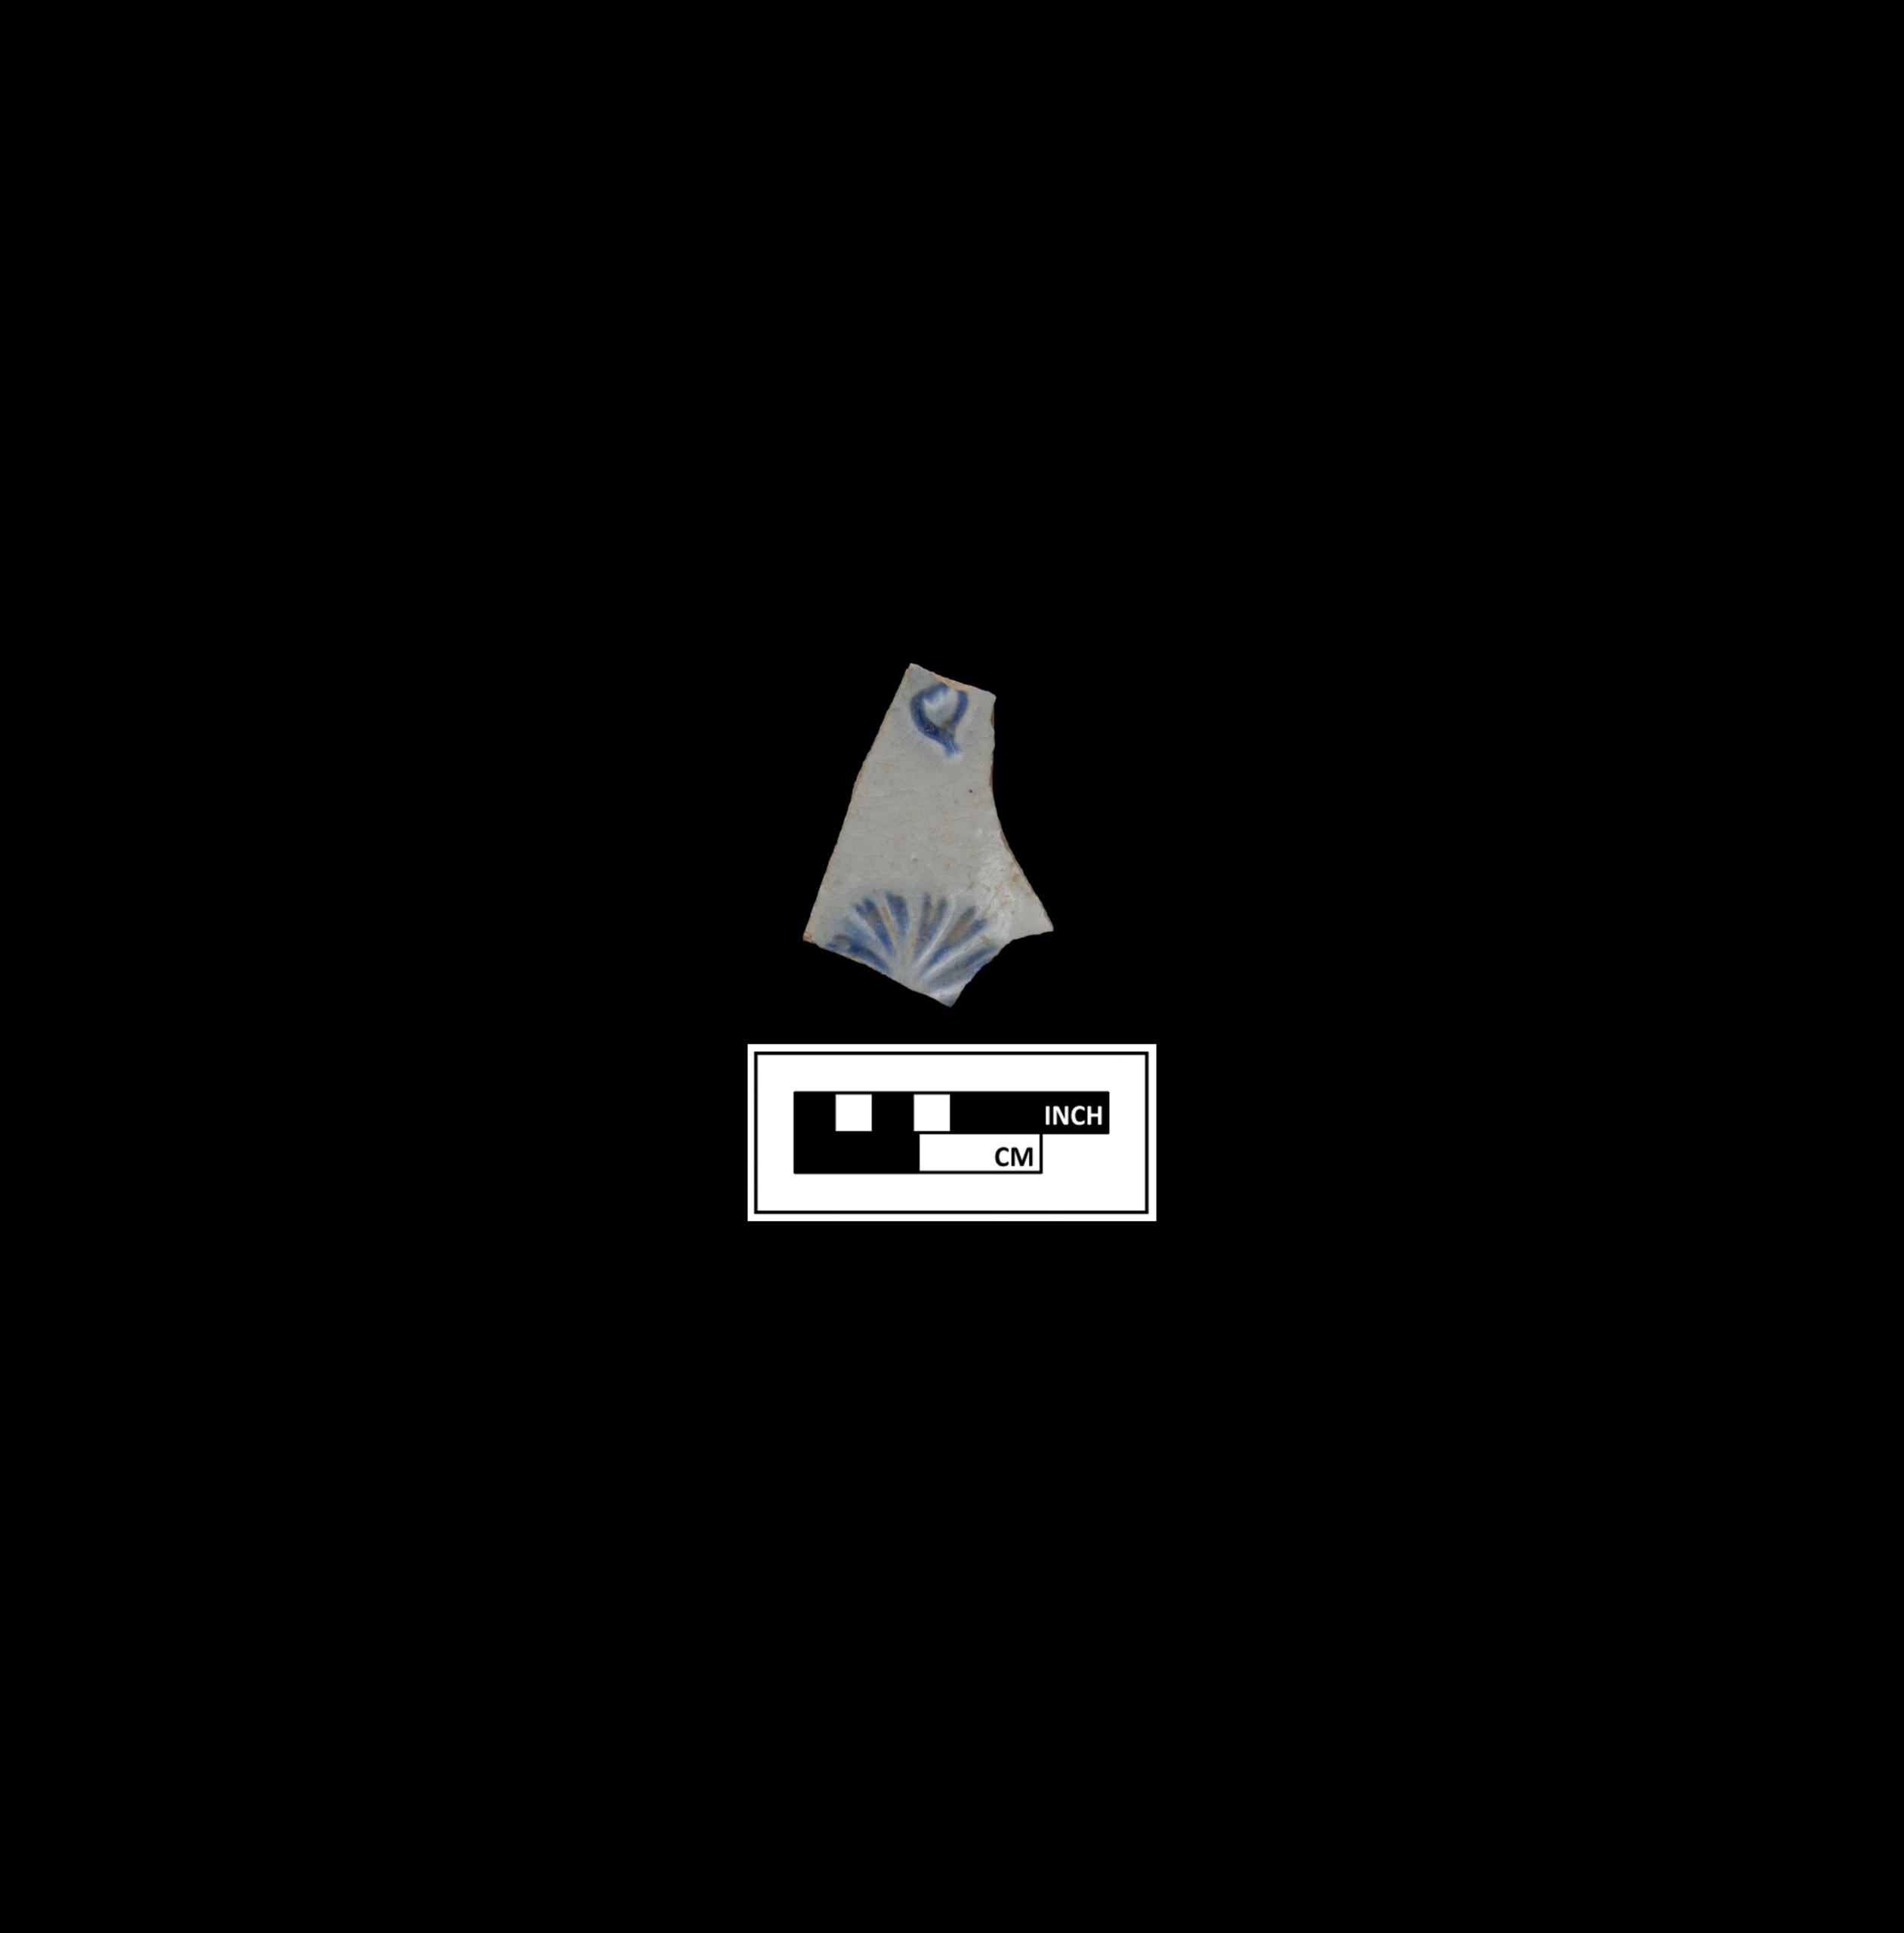 18ST1-270 CNEHA Image 1